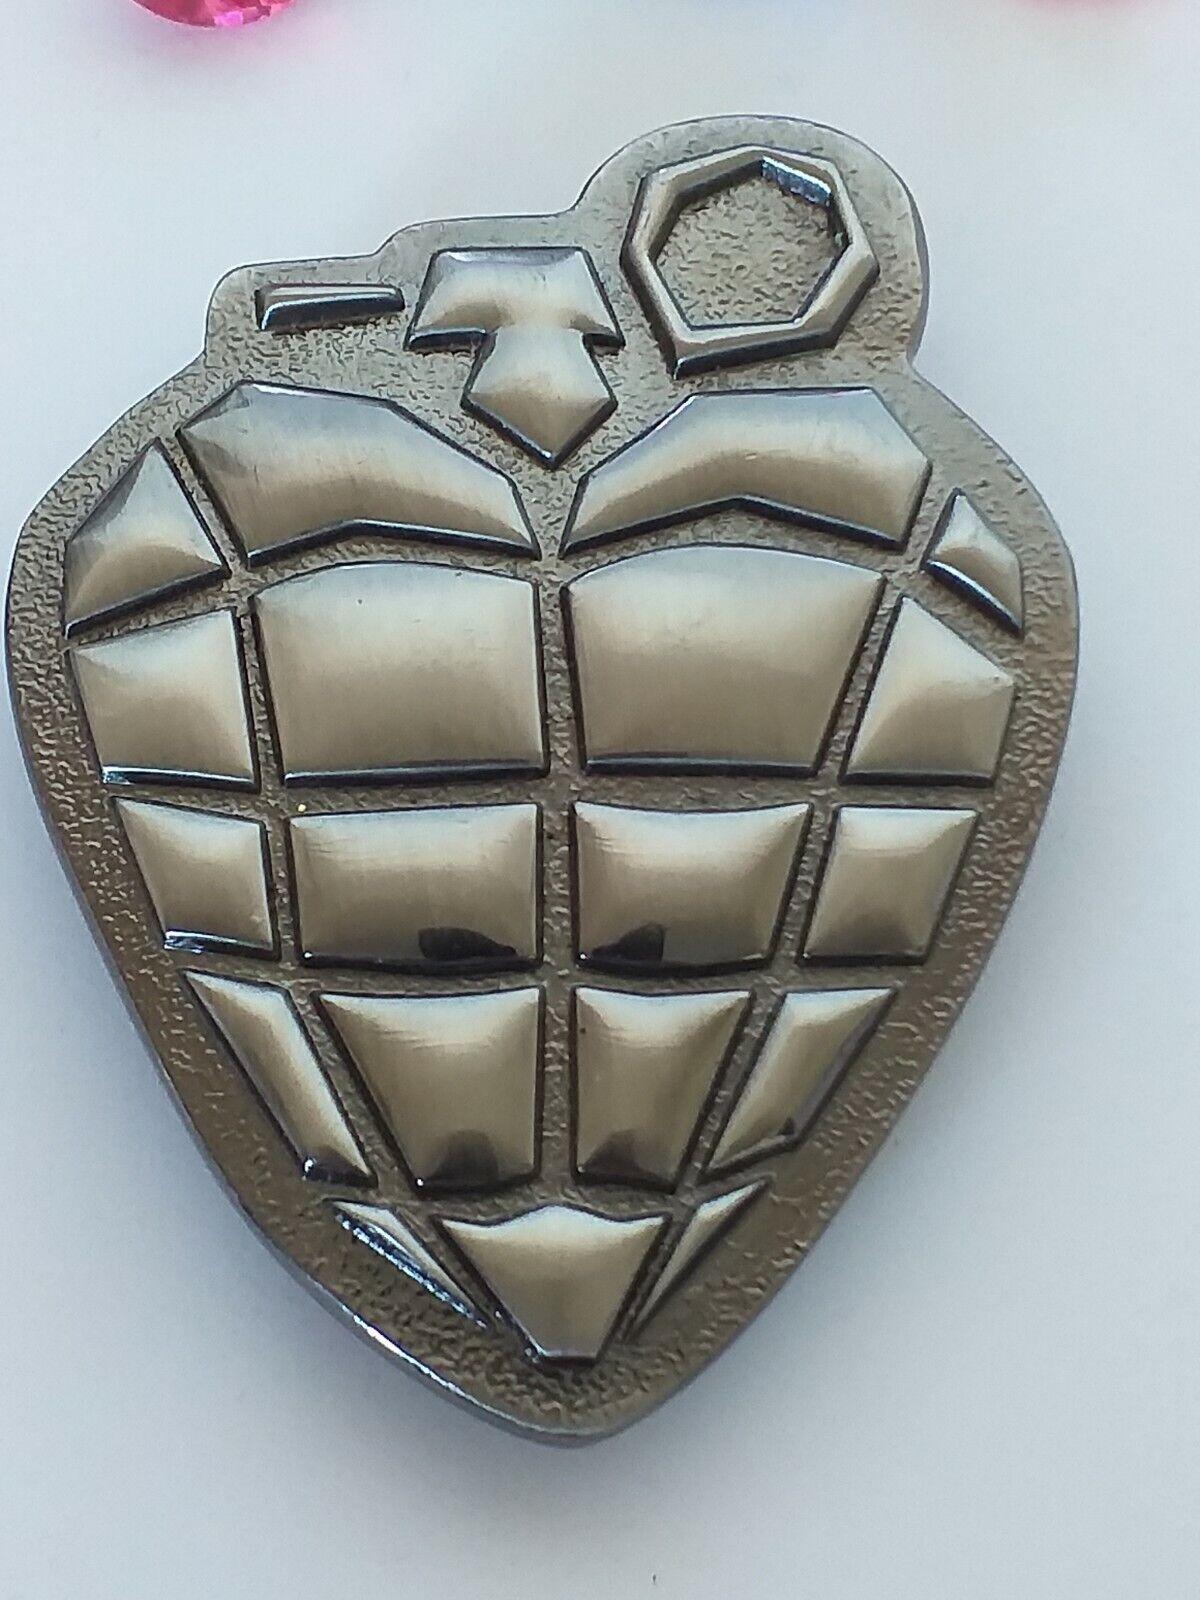 2004 Reprise Records hand grenade belt buckle